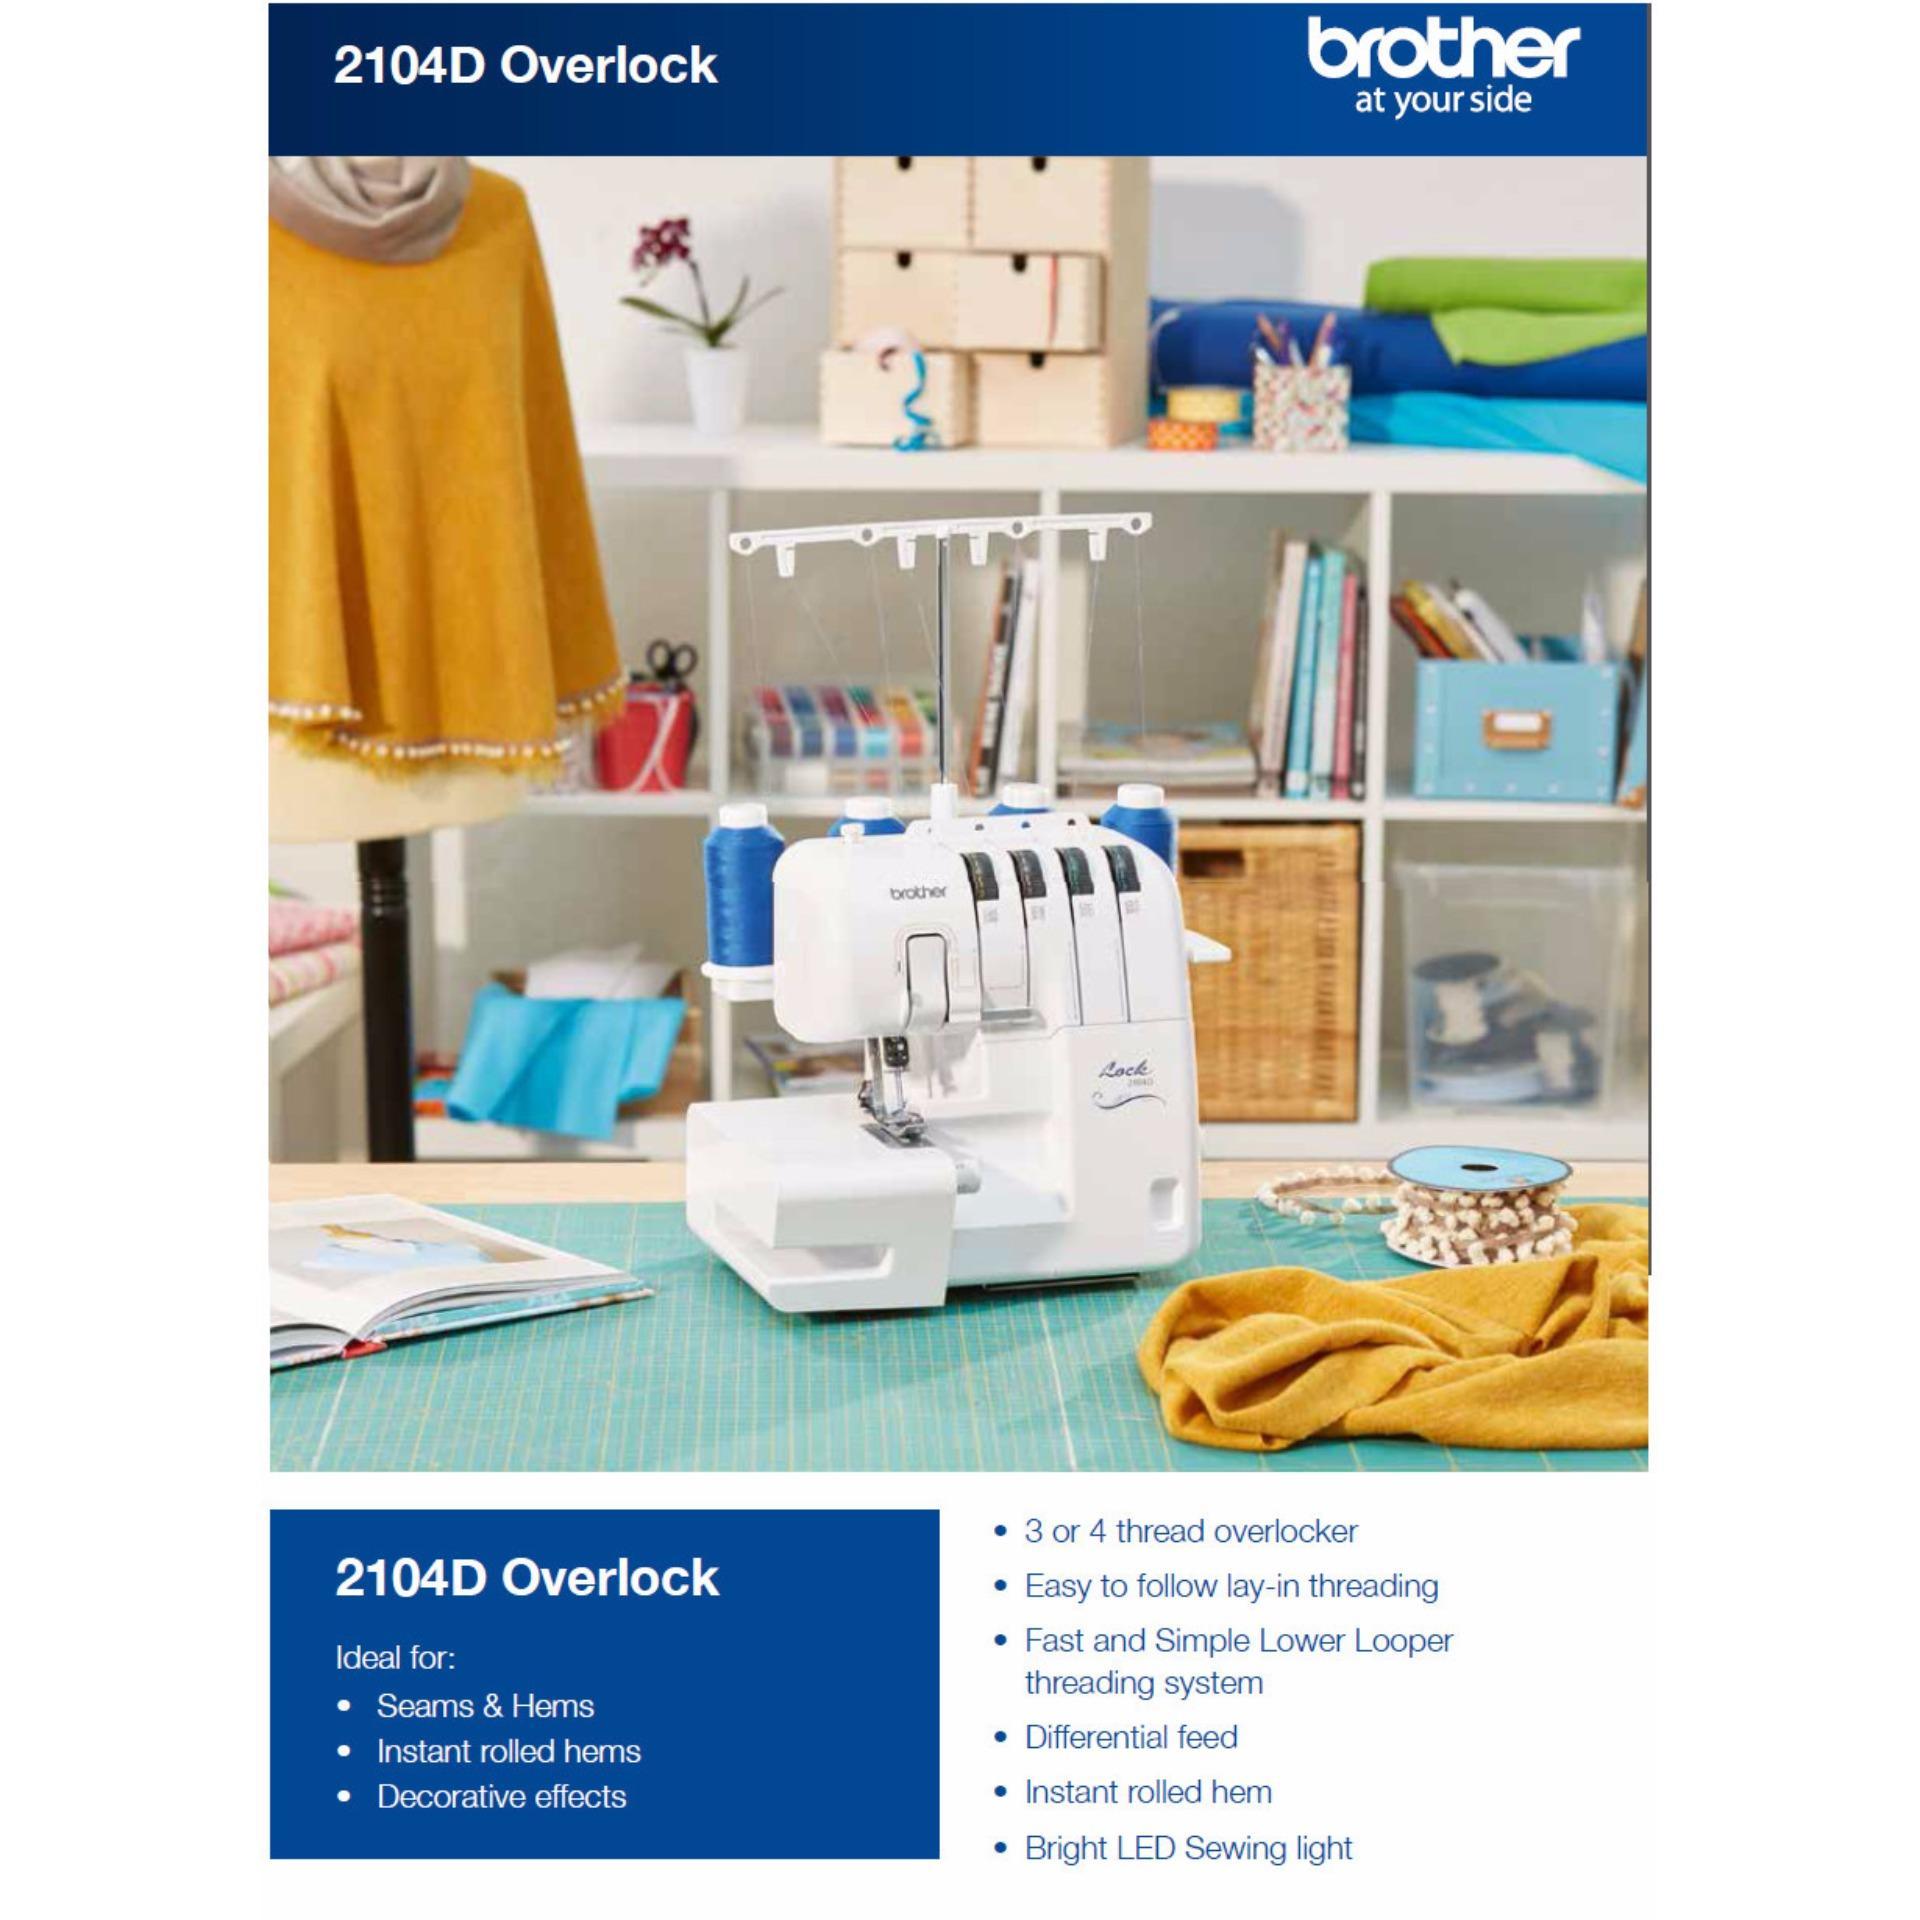 Máy Vắt Sổ Brother 2104D - Trắng